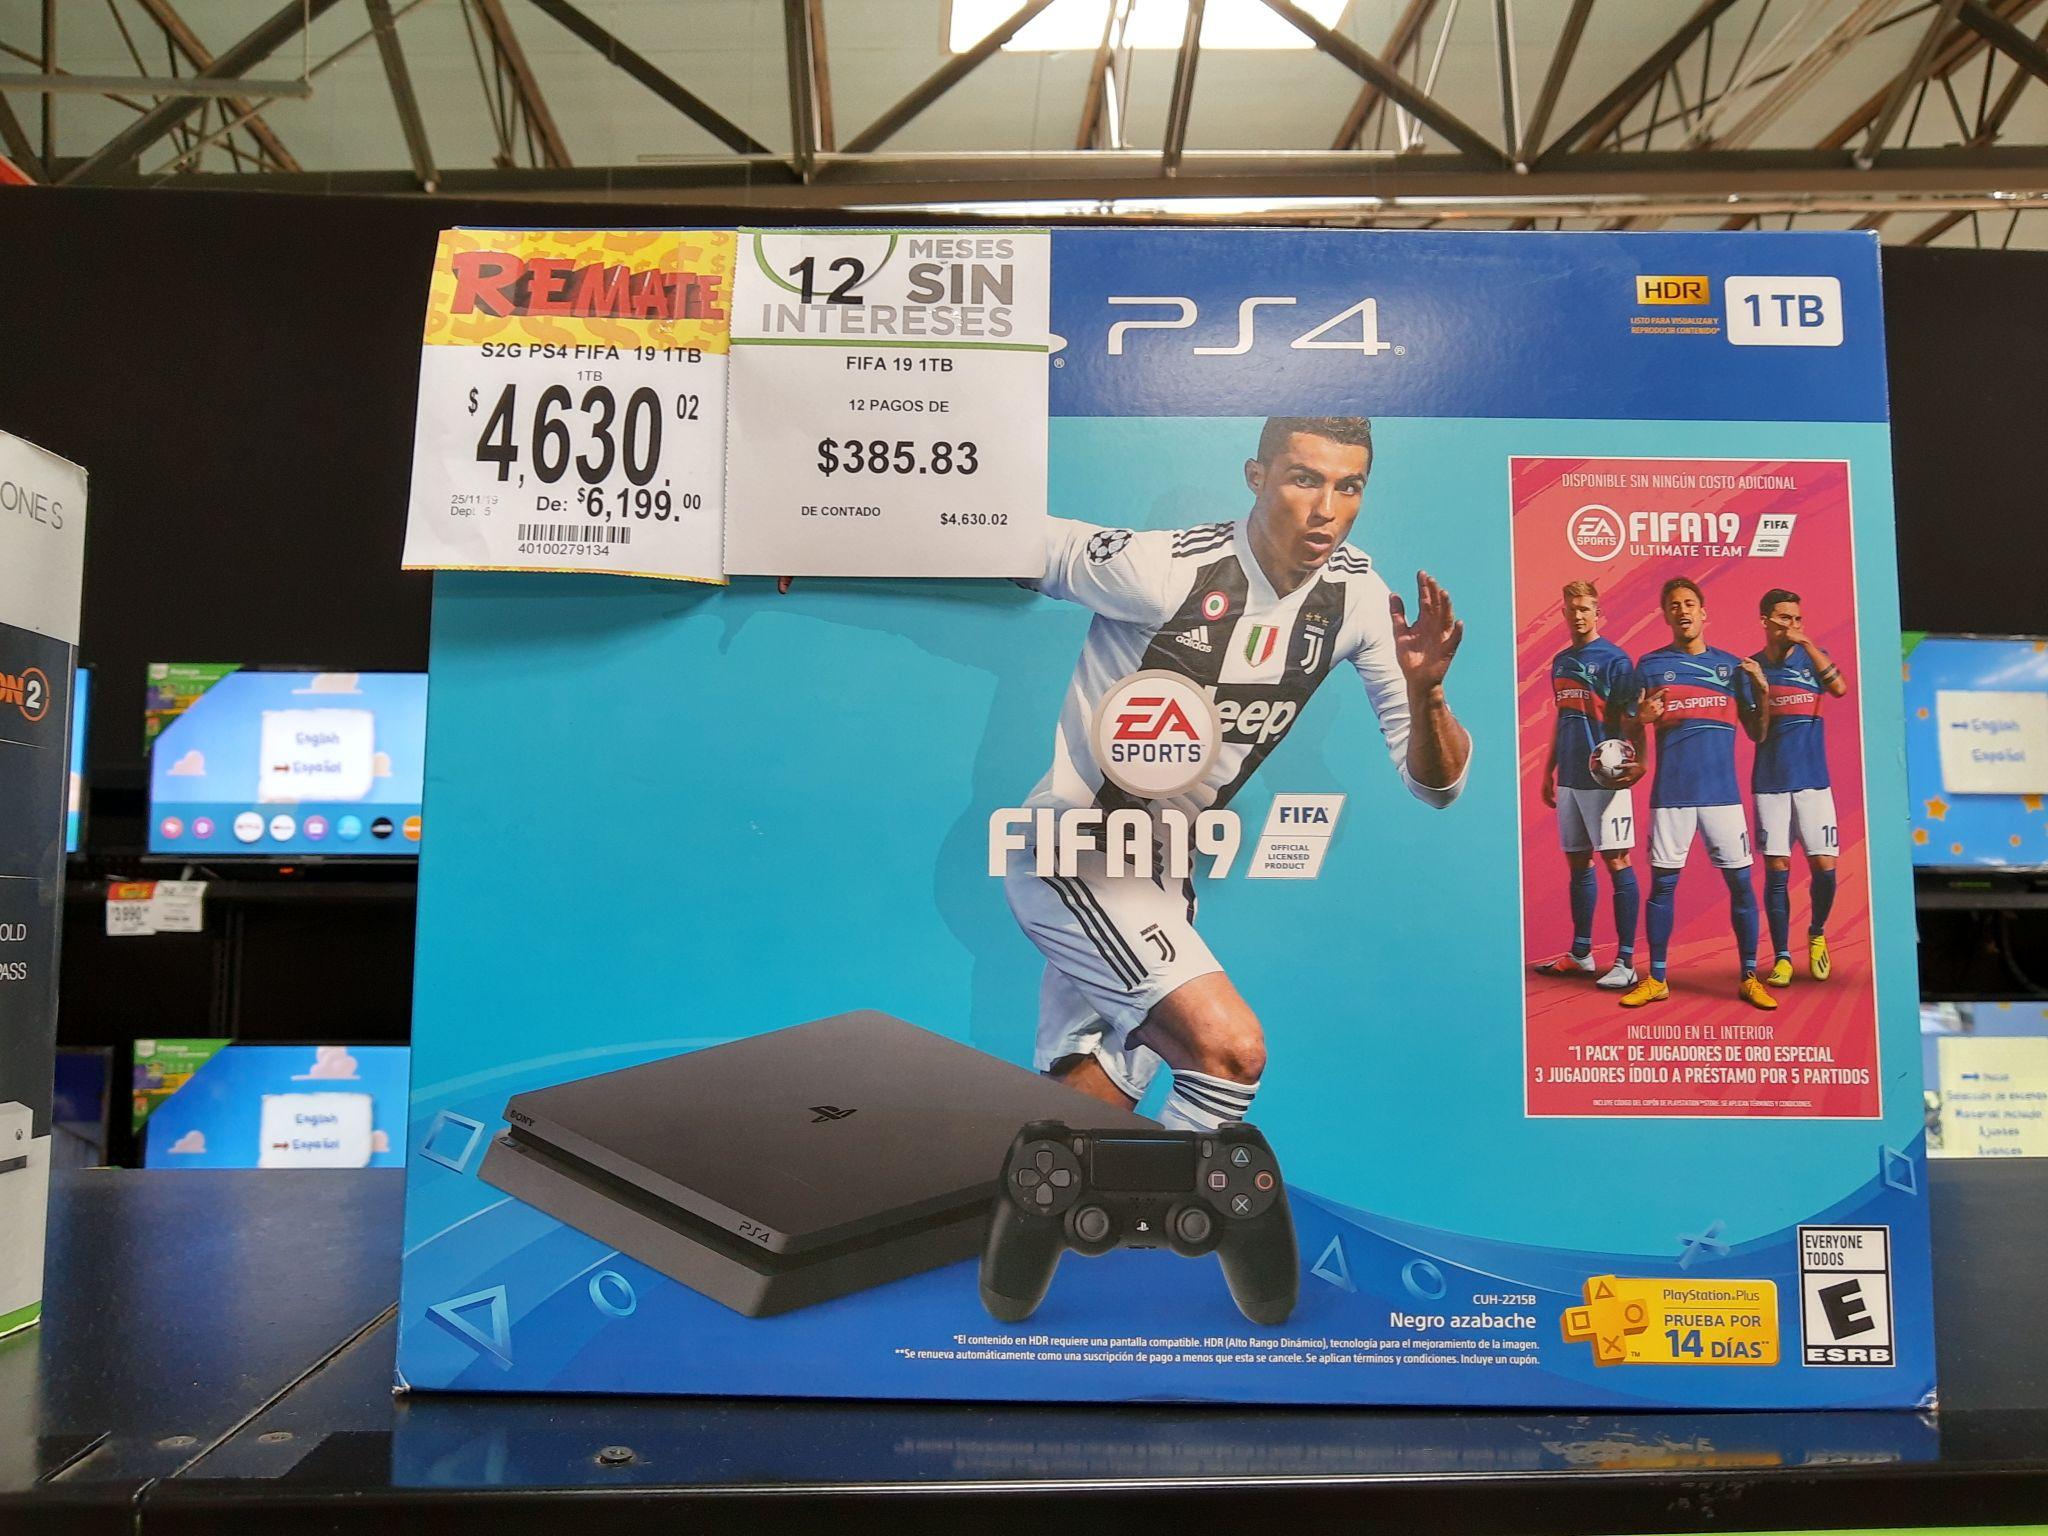 Bodega Aurrerá: PS4 1TB con FIFA 19